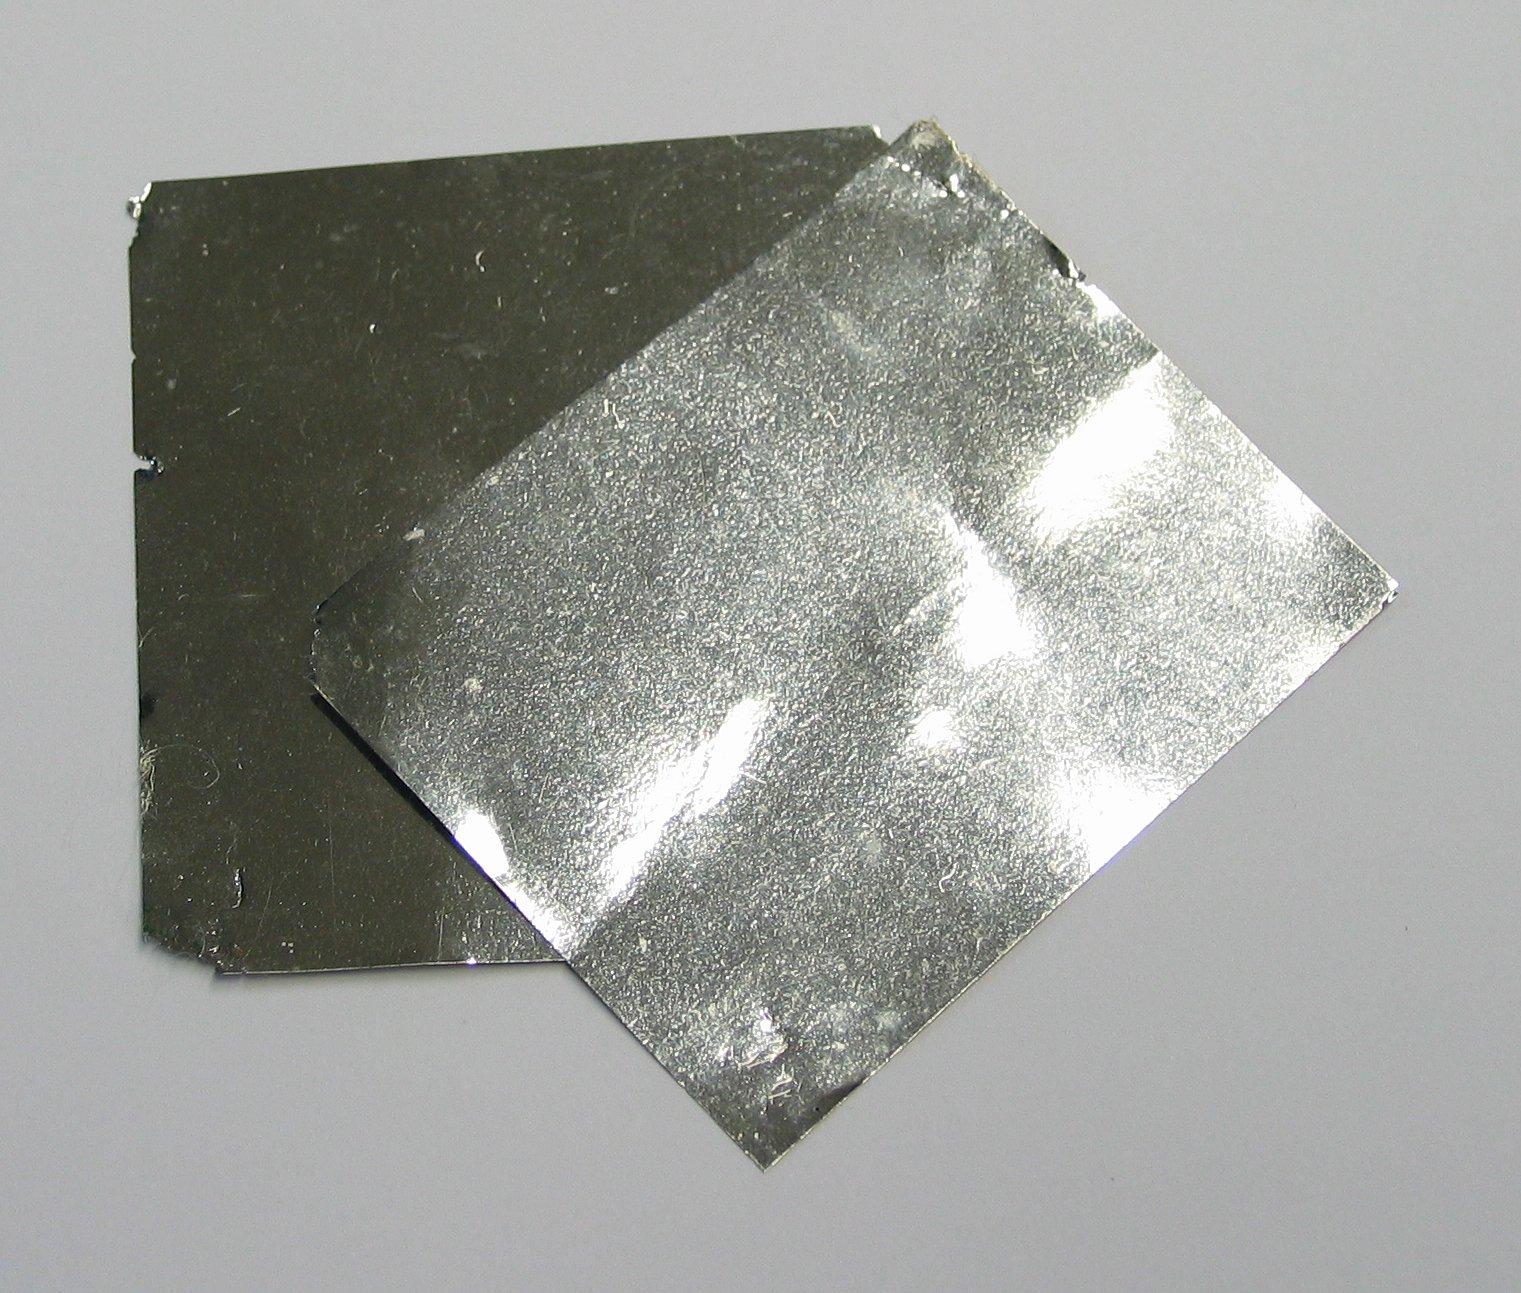 Iridium dating